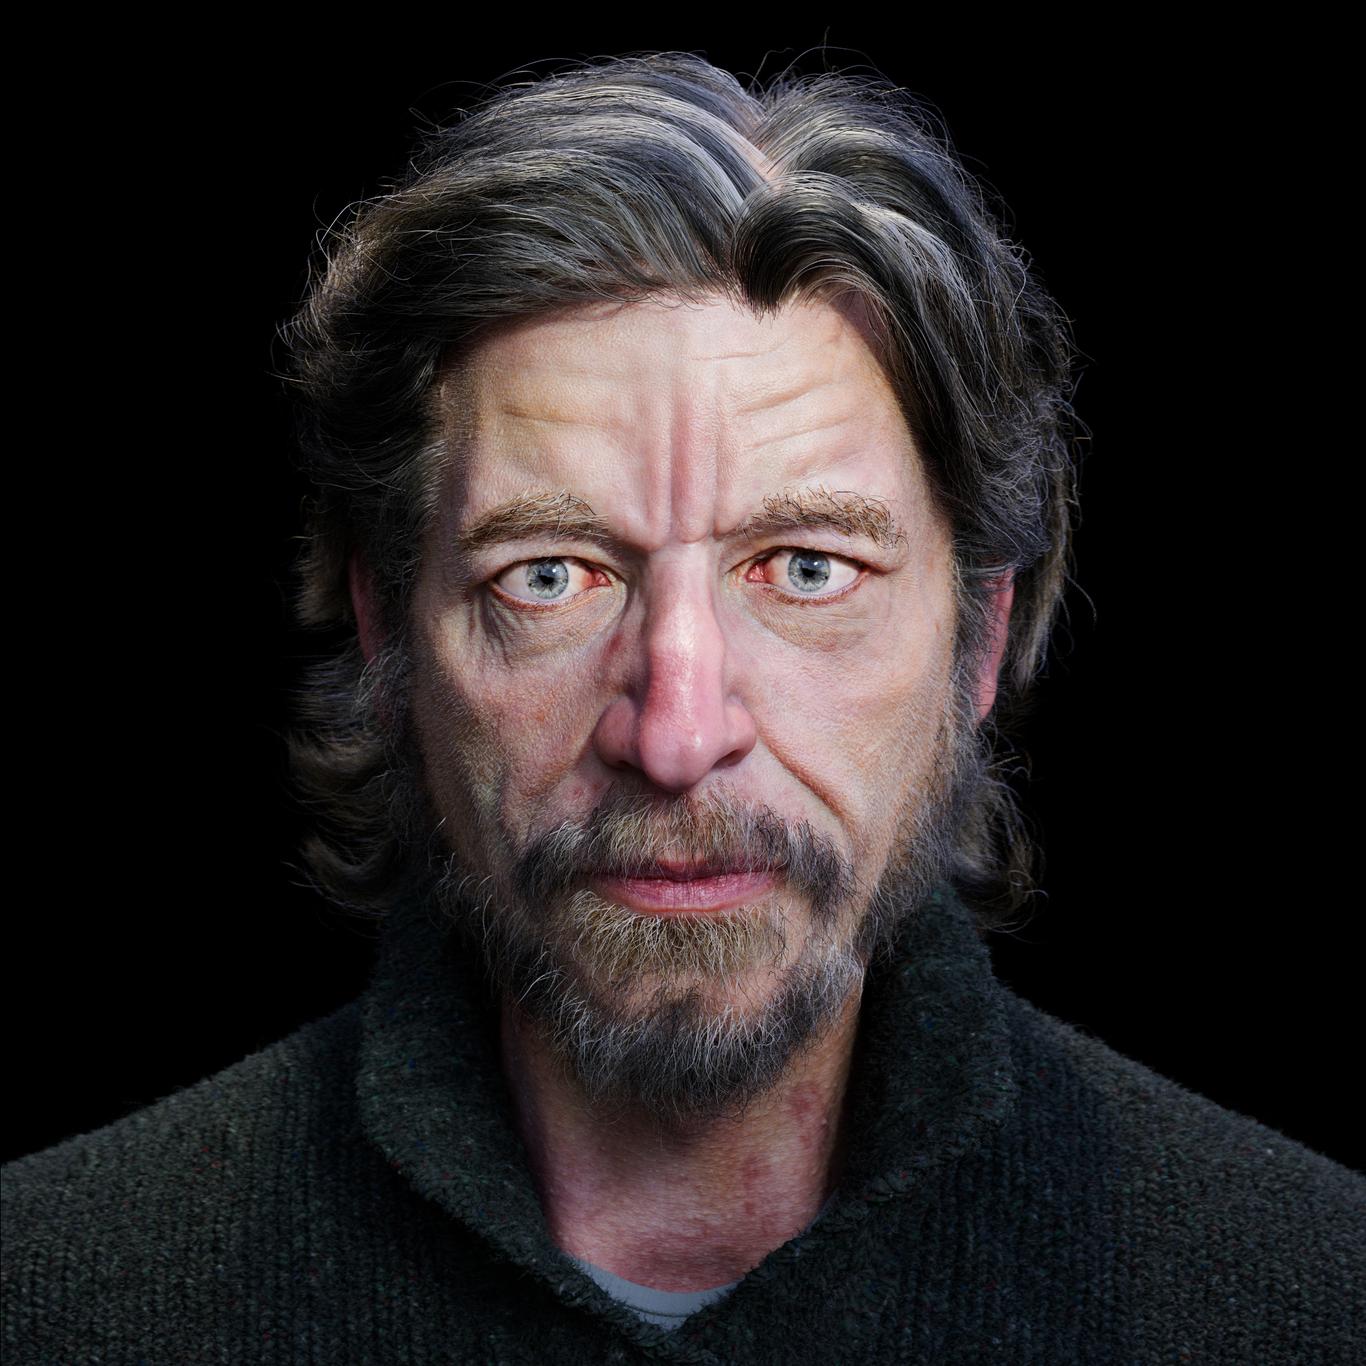 Portrait of Karl Ove Knausgaard